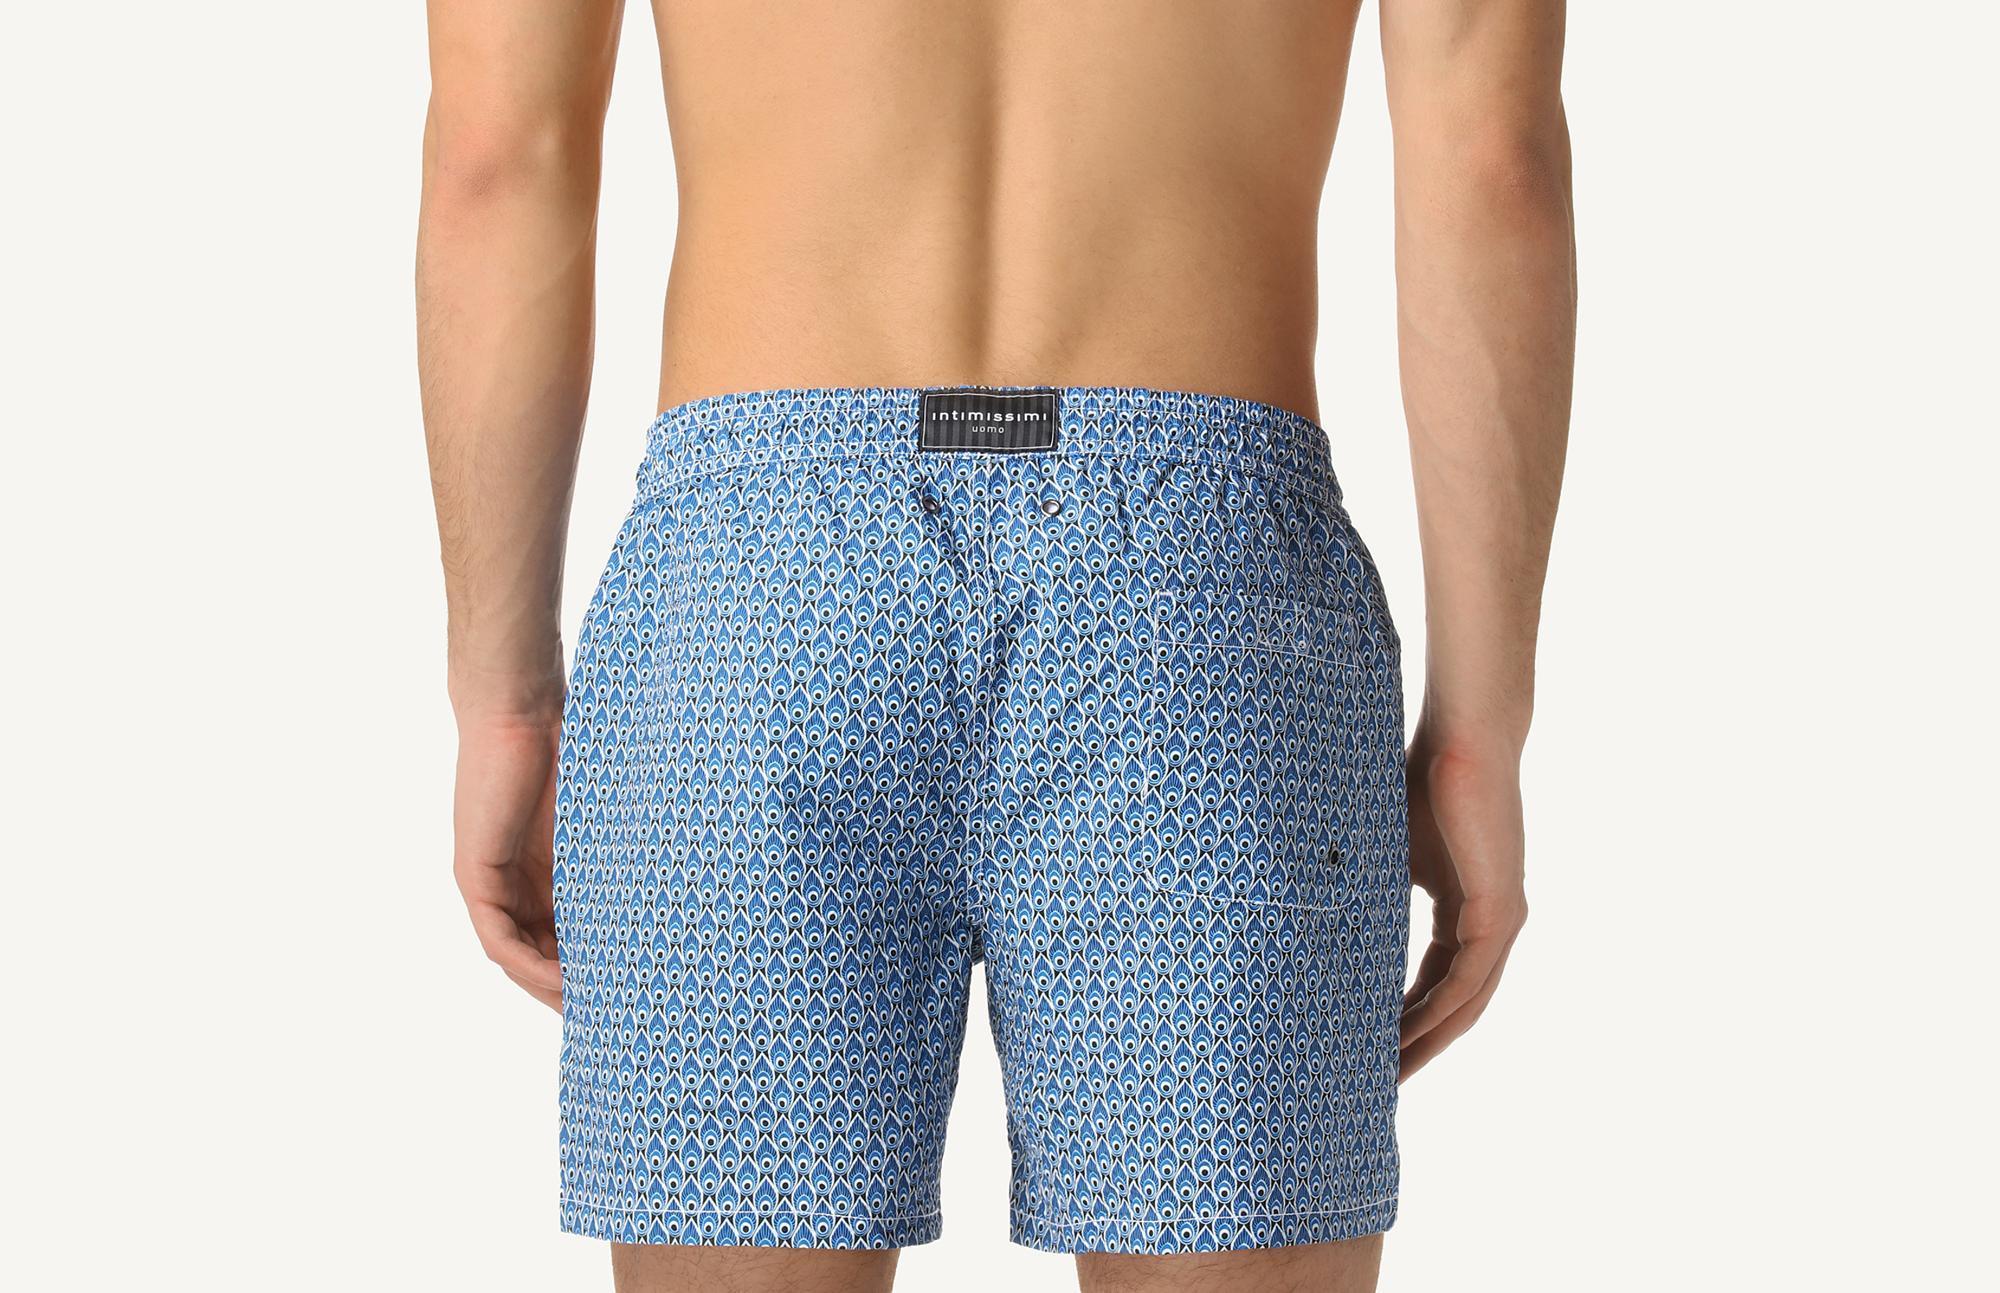 b617aeef14 Intimissimi - Blue Foulard Print Mid-length Swim Shorts for Men - Lyst.  View fullscreen